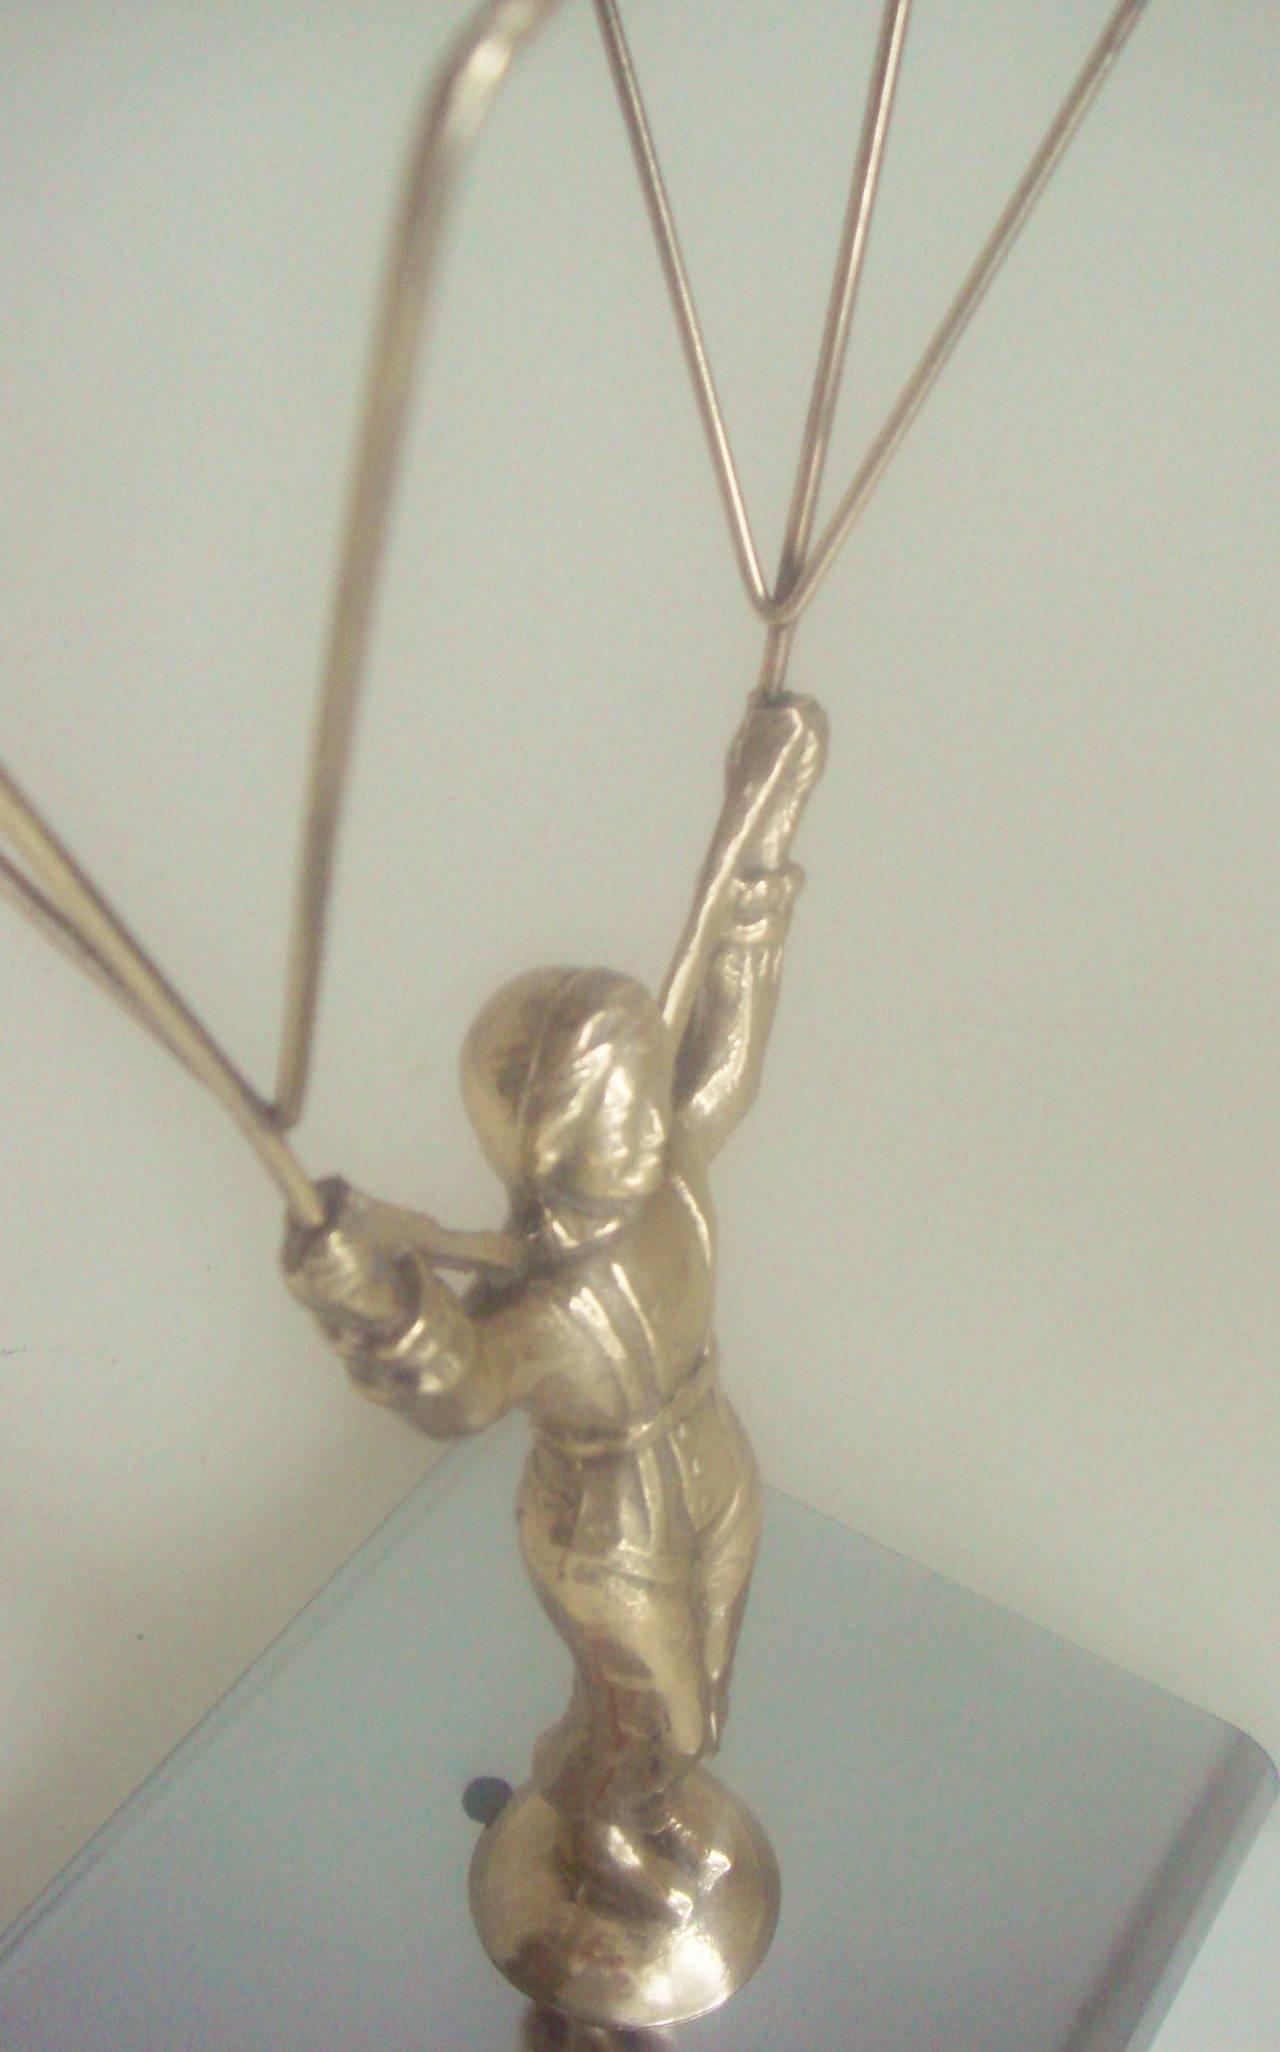 1960s Novelty Lighting Lamp : American Art Deco Chrome and Brass Novelty Parachute Jumper Lamp. at 1stdibs